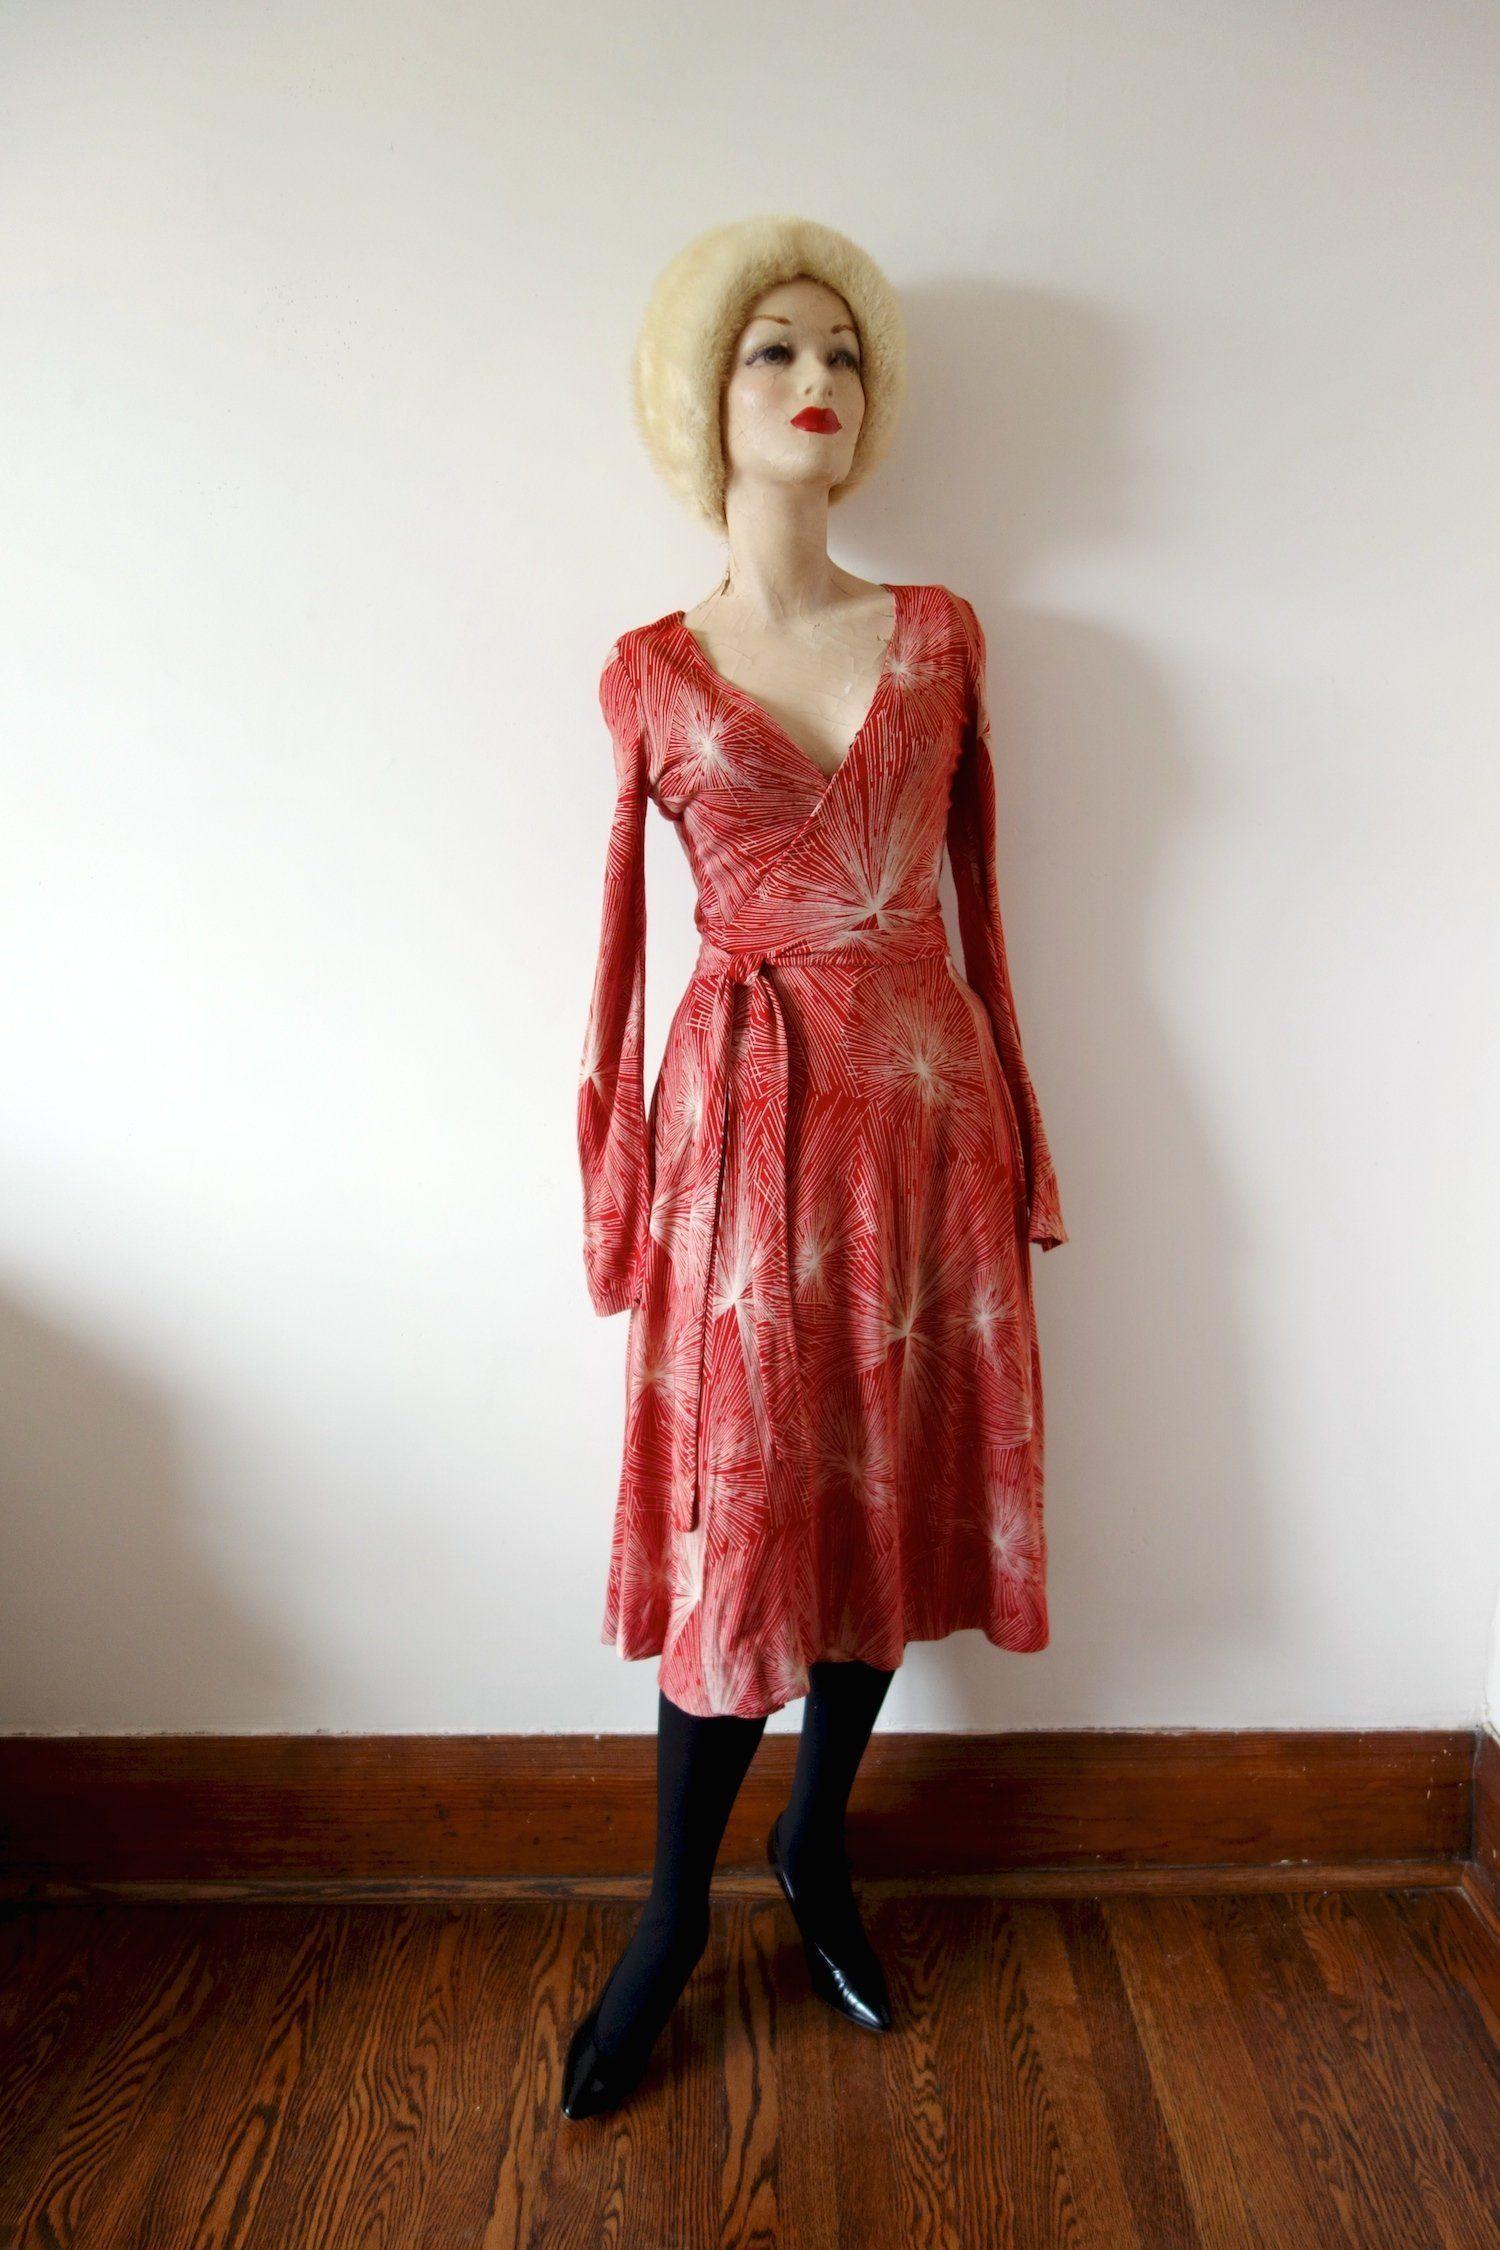 1970s Diane Von Furstenberg Wrap Dress Vintage Dvf Knit Dress With Red And White Fireworks Print Diane Von Furstenberg Wrap Dress Vintage Dresses Knit Dress [ 2250 x 1500 Pixel ]